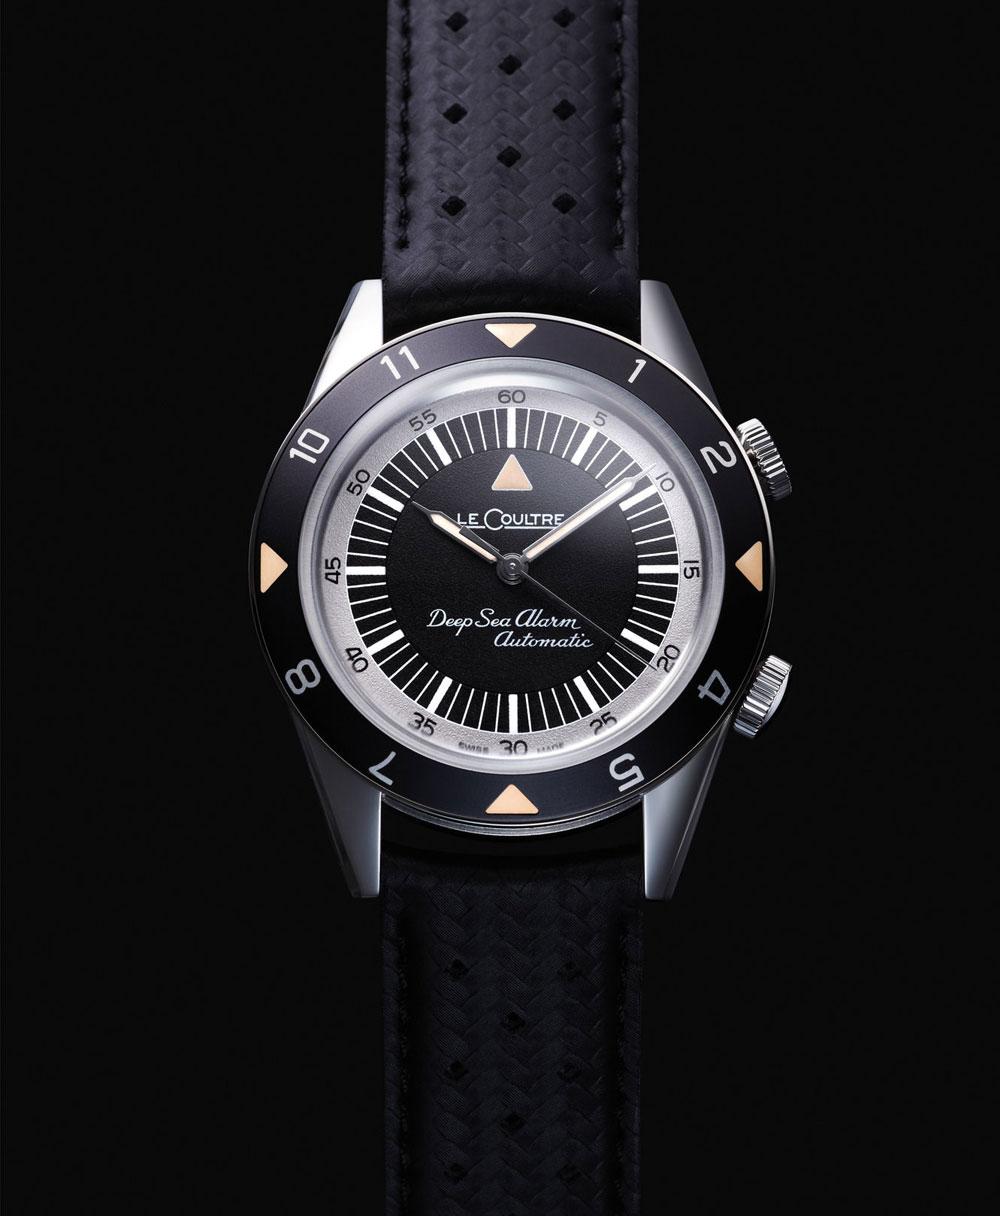 sea watch - photo #31